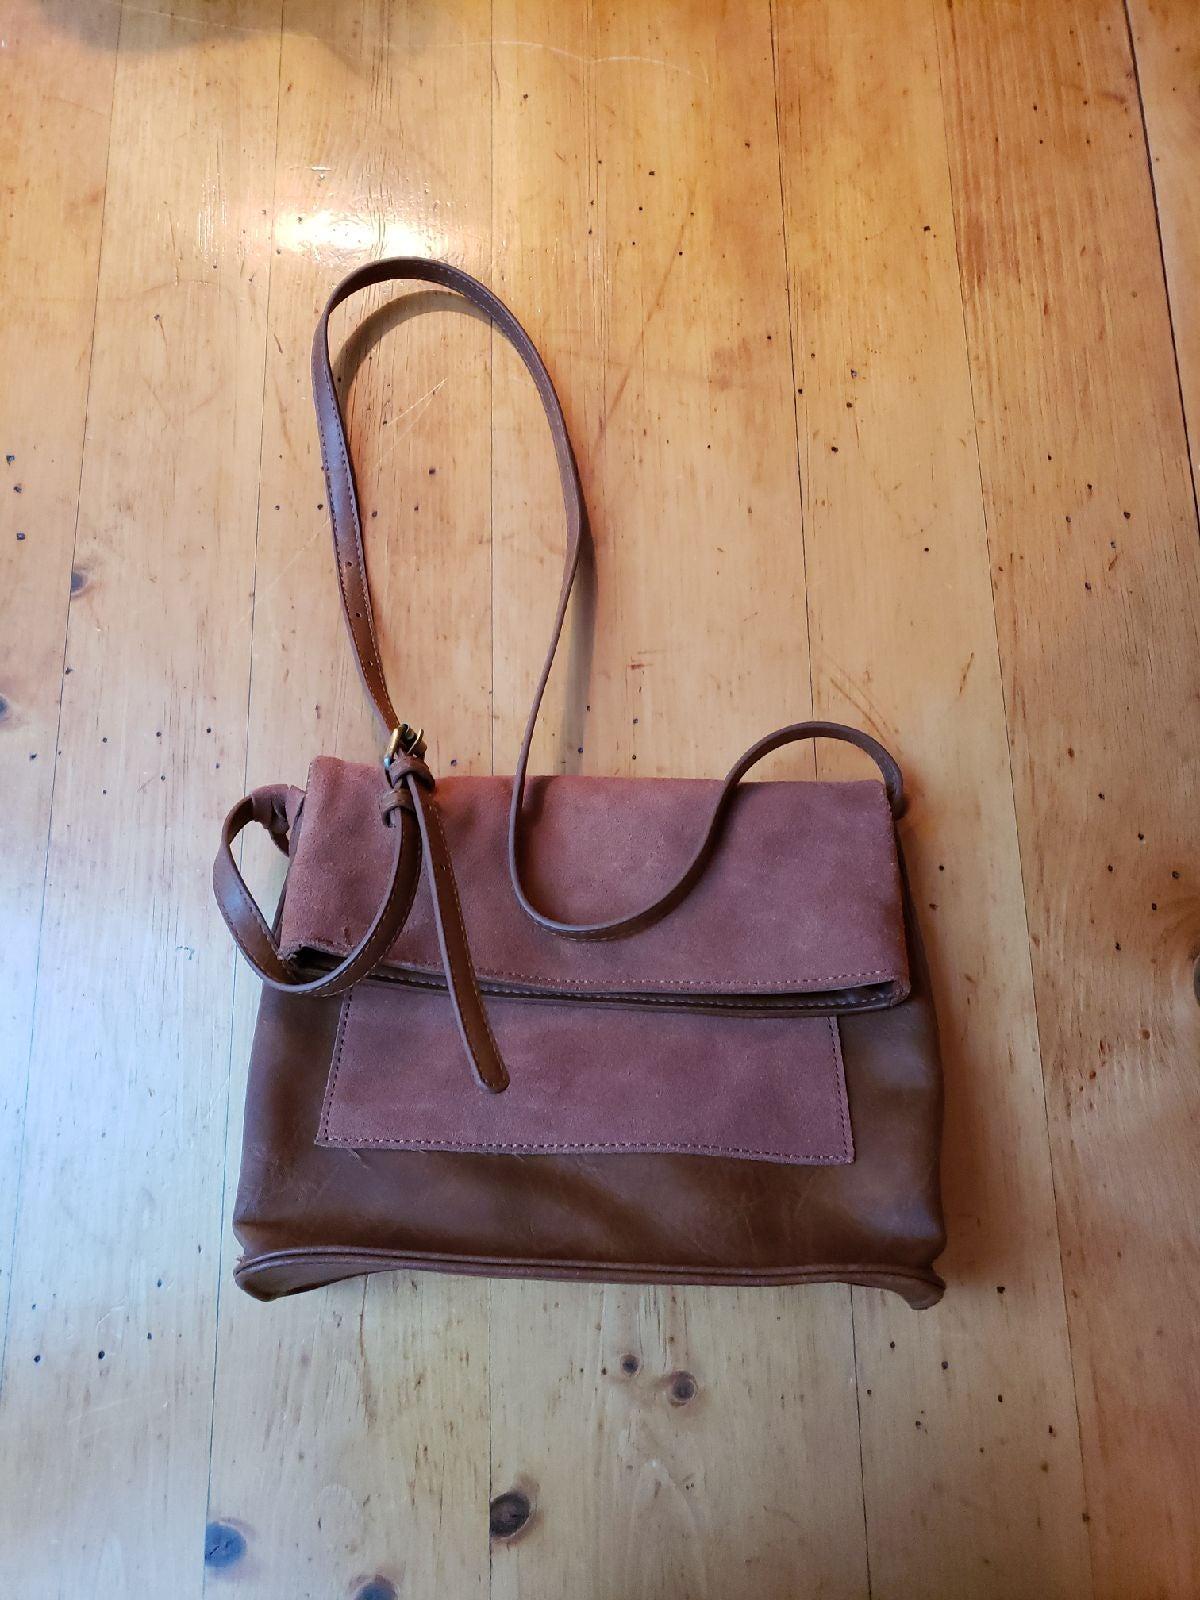 Antik Kraft Leather-like handbag purse o